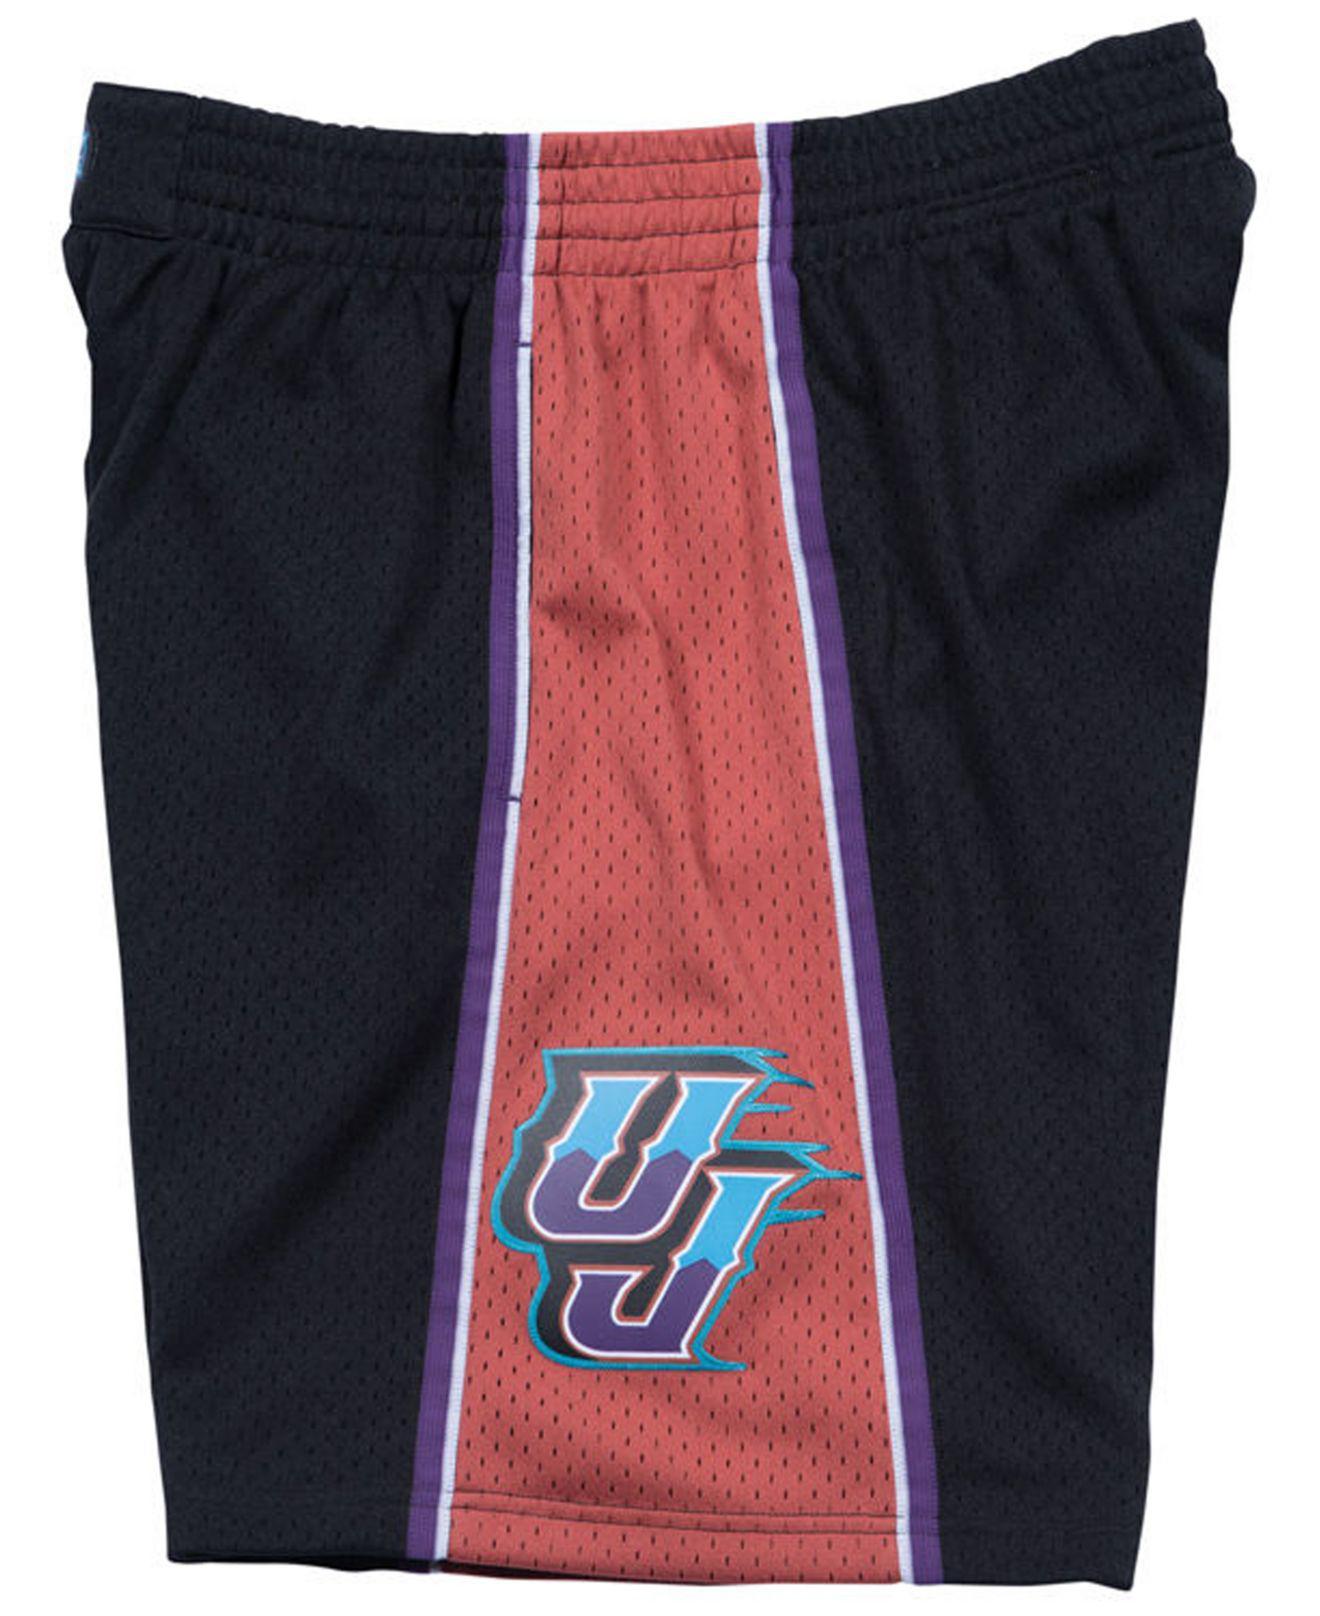 32104f829c8b Lyst - Mitchell   Ness Utah Jazz Authentic Nba Shorts in Black for Men